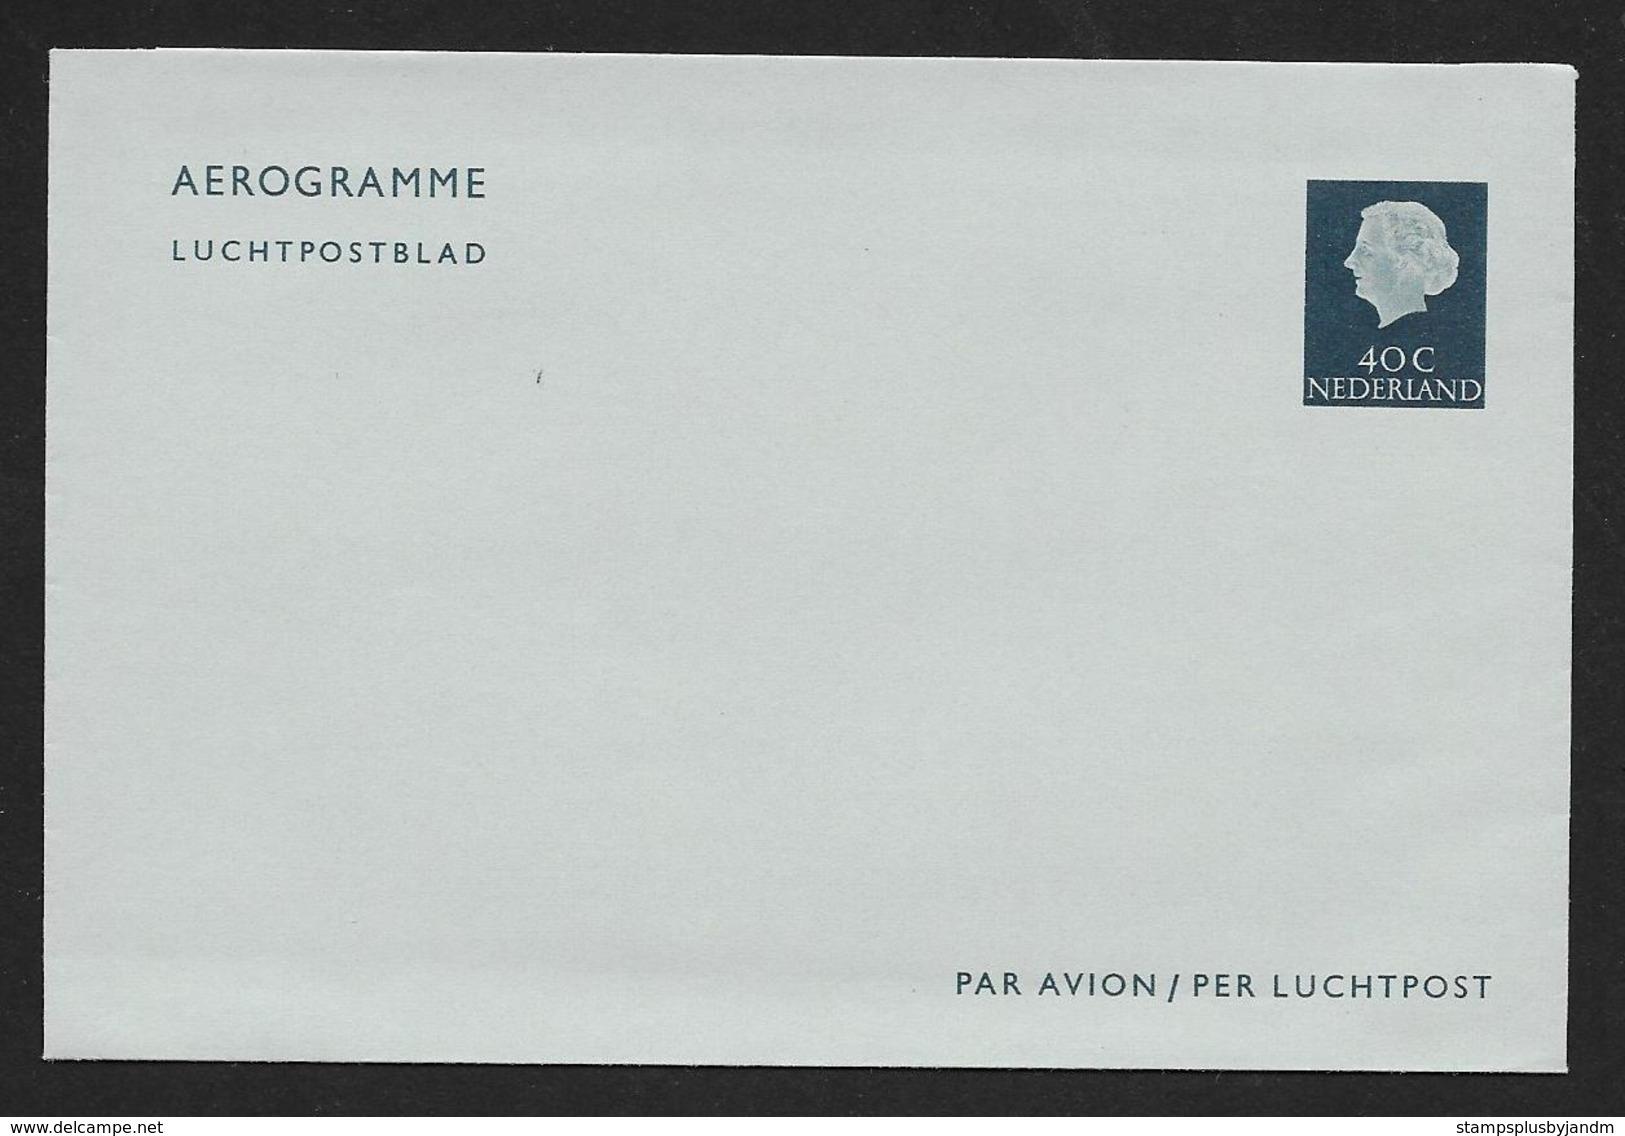 NETHERLANDS Aerogramme 40c Queen C1950s-1960s Unused! STK#X21171 - Postal Stationery